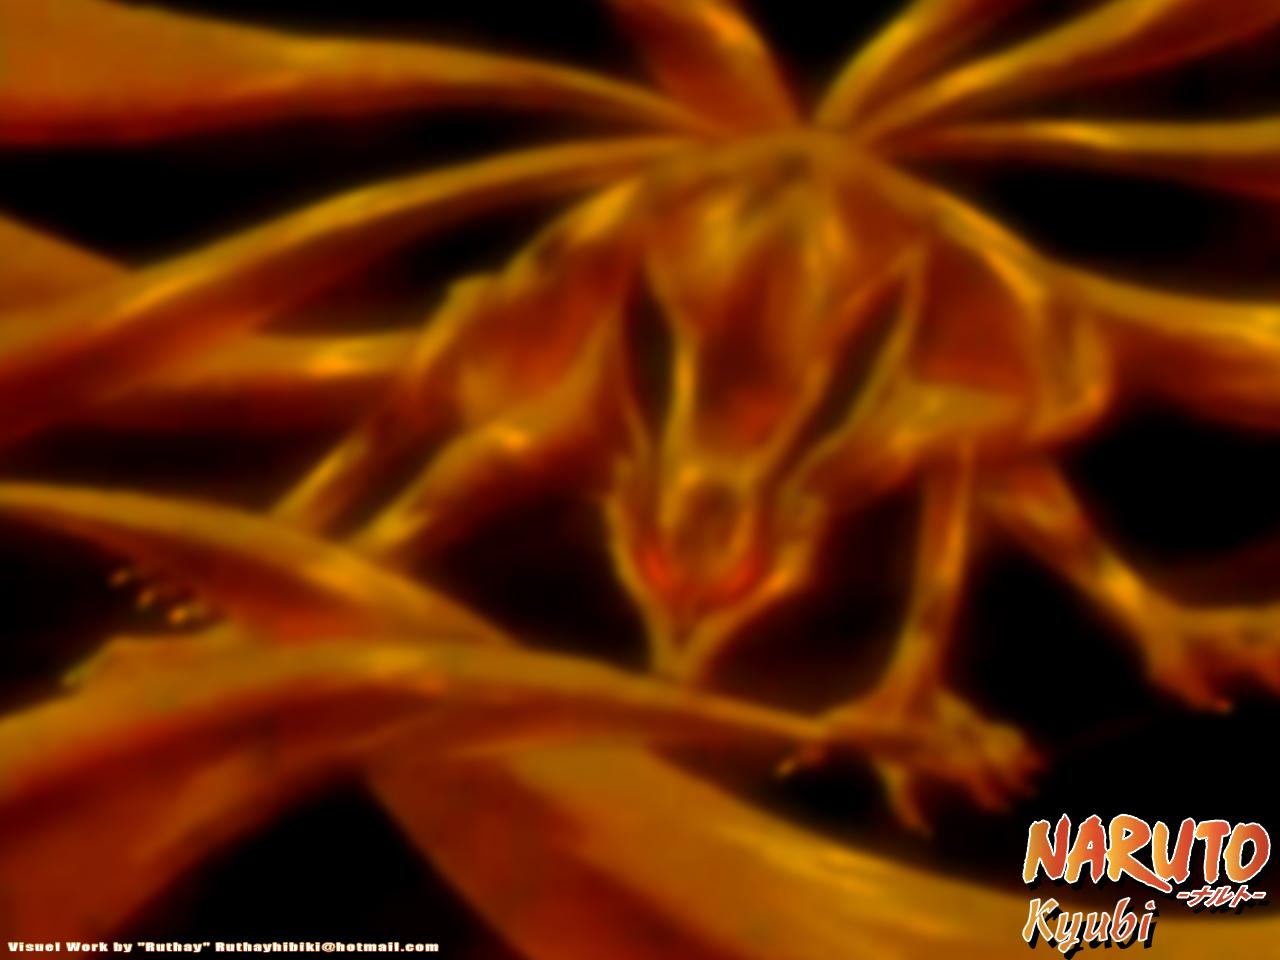 Fonds d'écran Manga Naruto Ruthay Naruto Kyubi 02